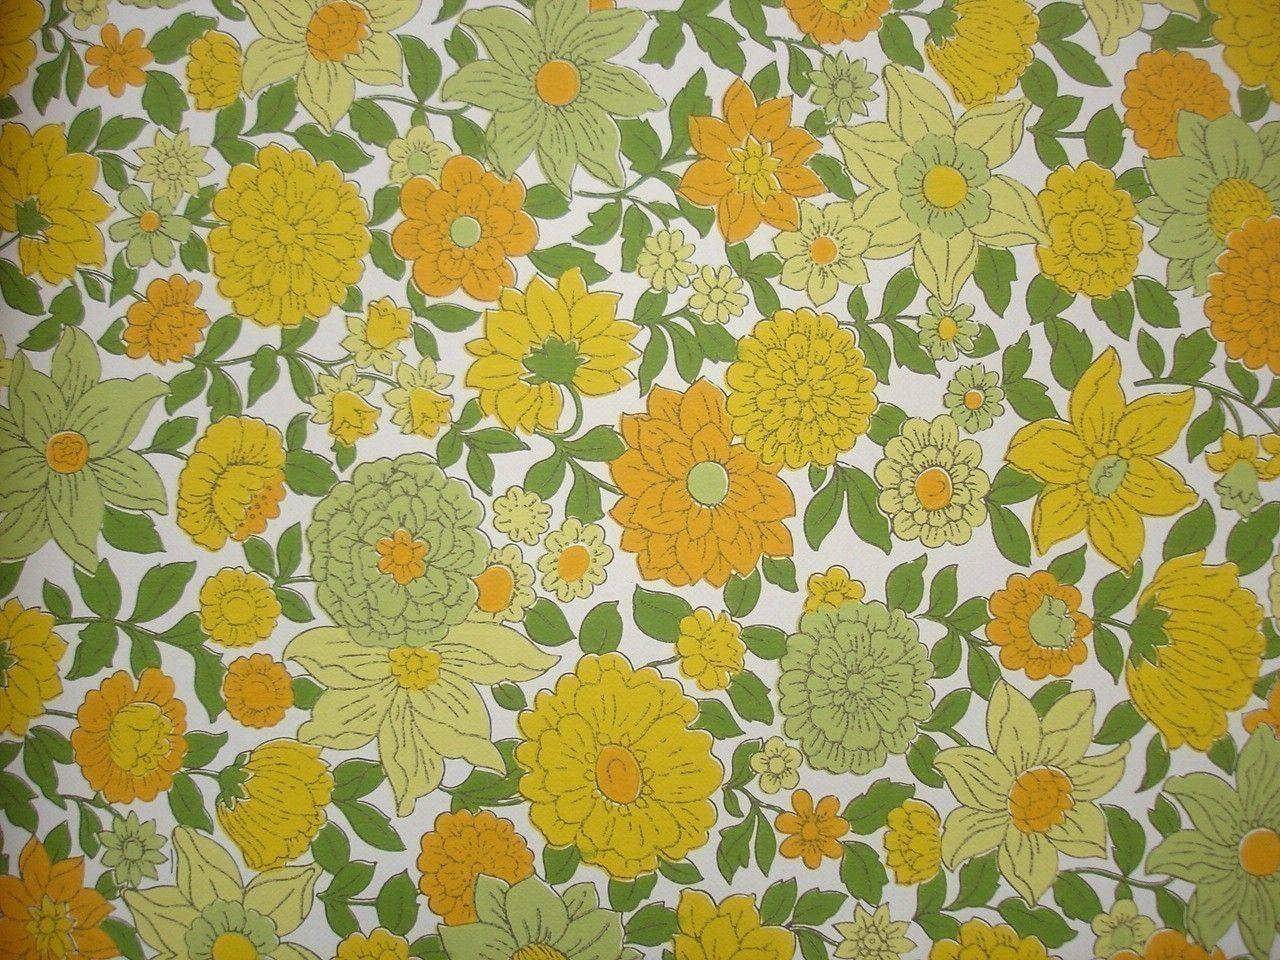 Kitchen wallpaper retro - Vintage Wallpaper Yellow Orange And Green Floral